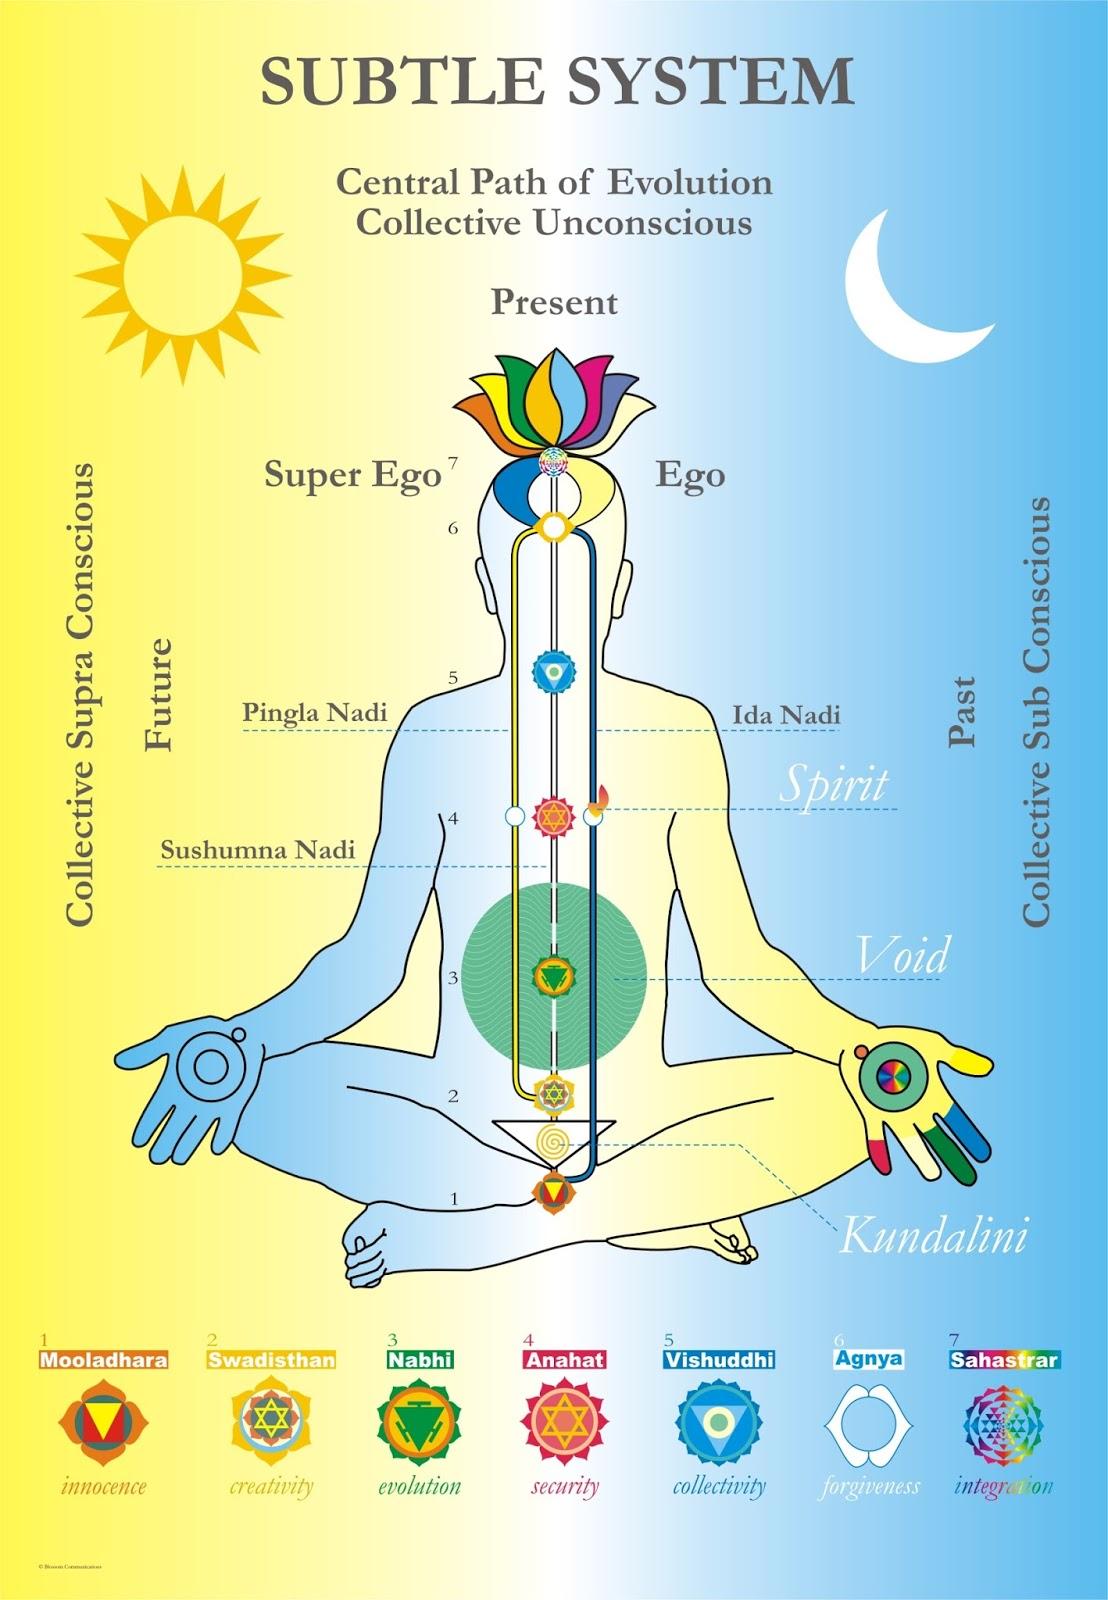 Drawn river nirmal nadi Others meditation can 3 The